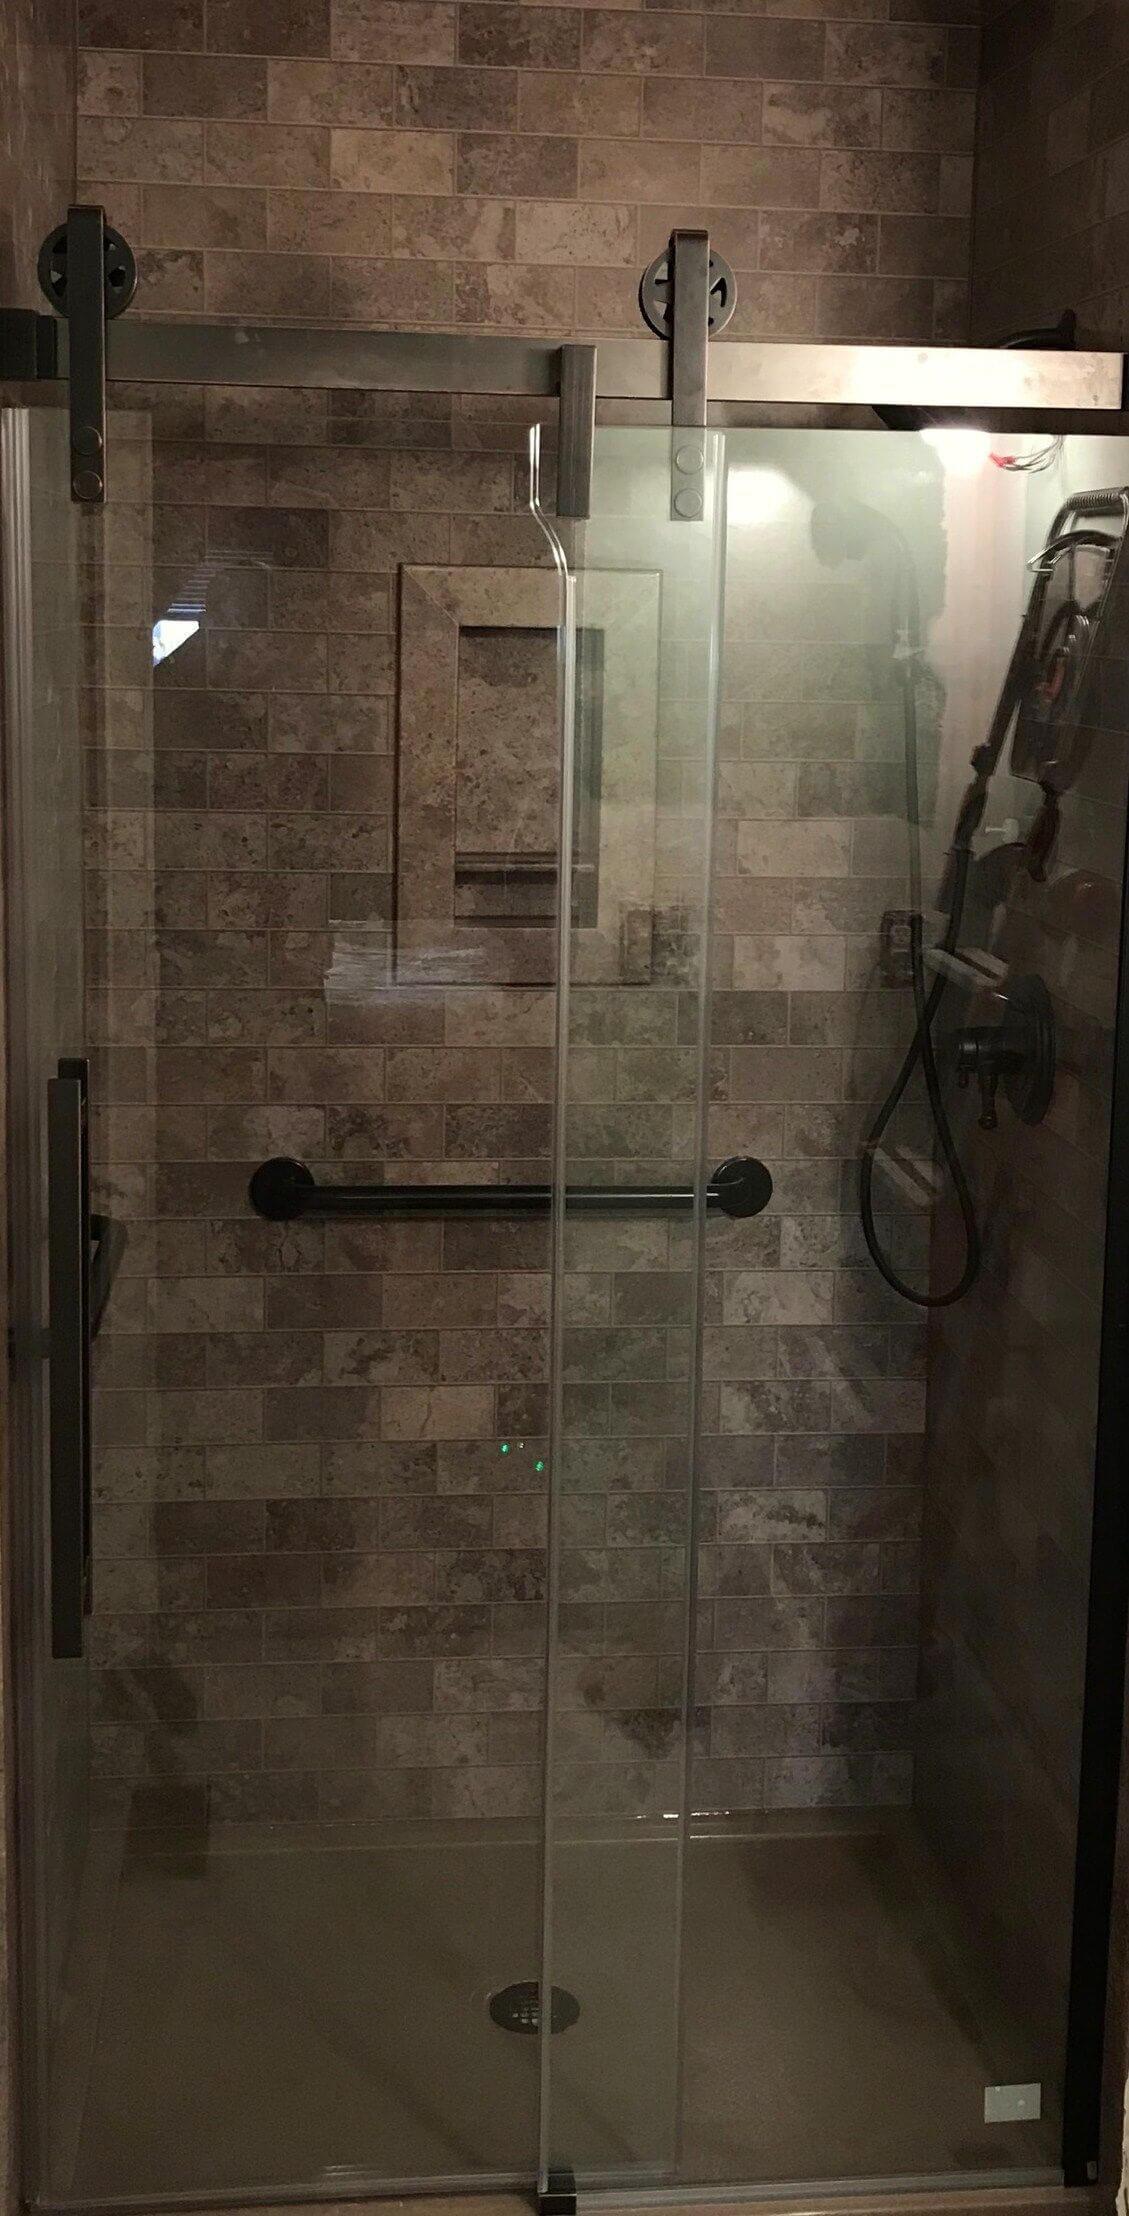 Astounding Tub To Shower Conversion Centerpoint Renovations Download Free Architecture Designs Scobabritishbridgeorg